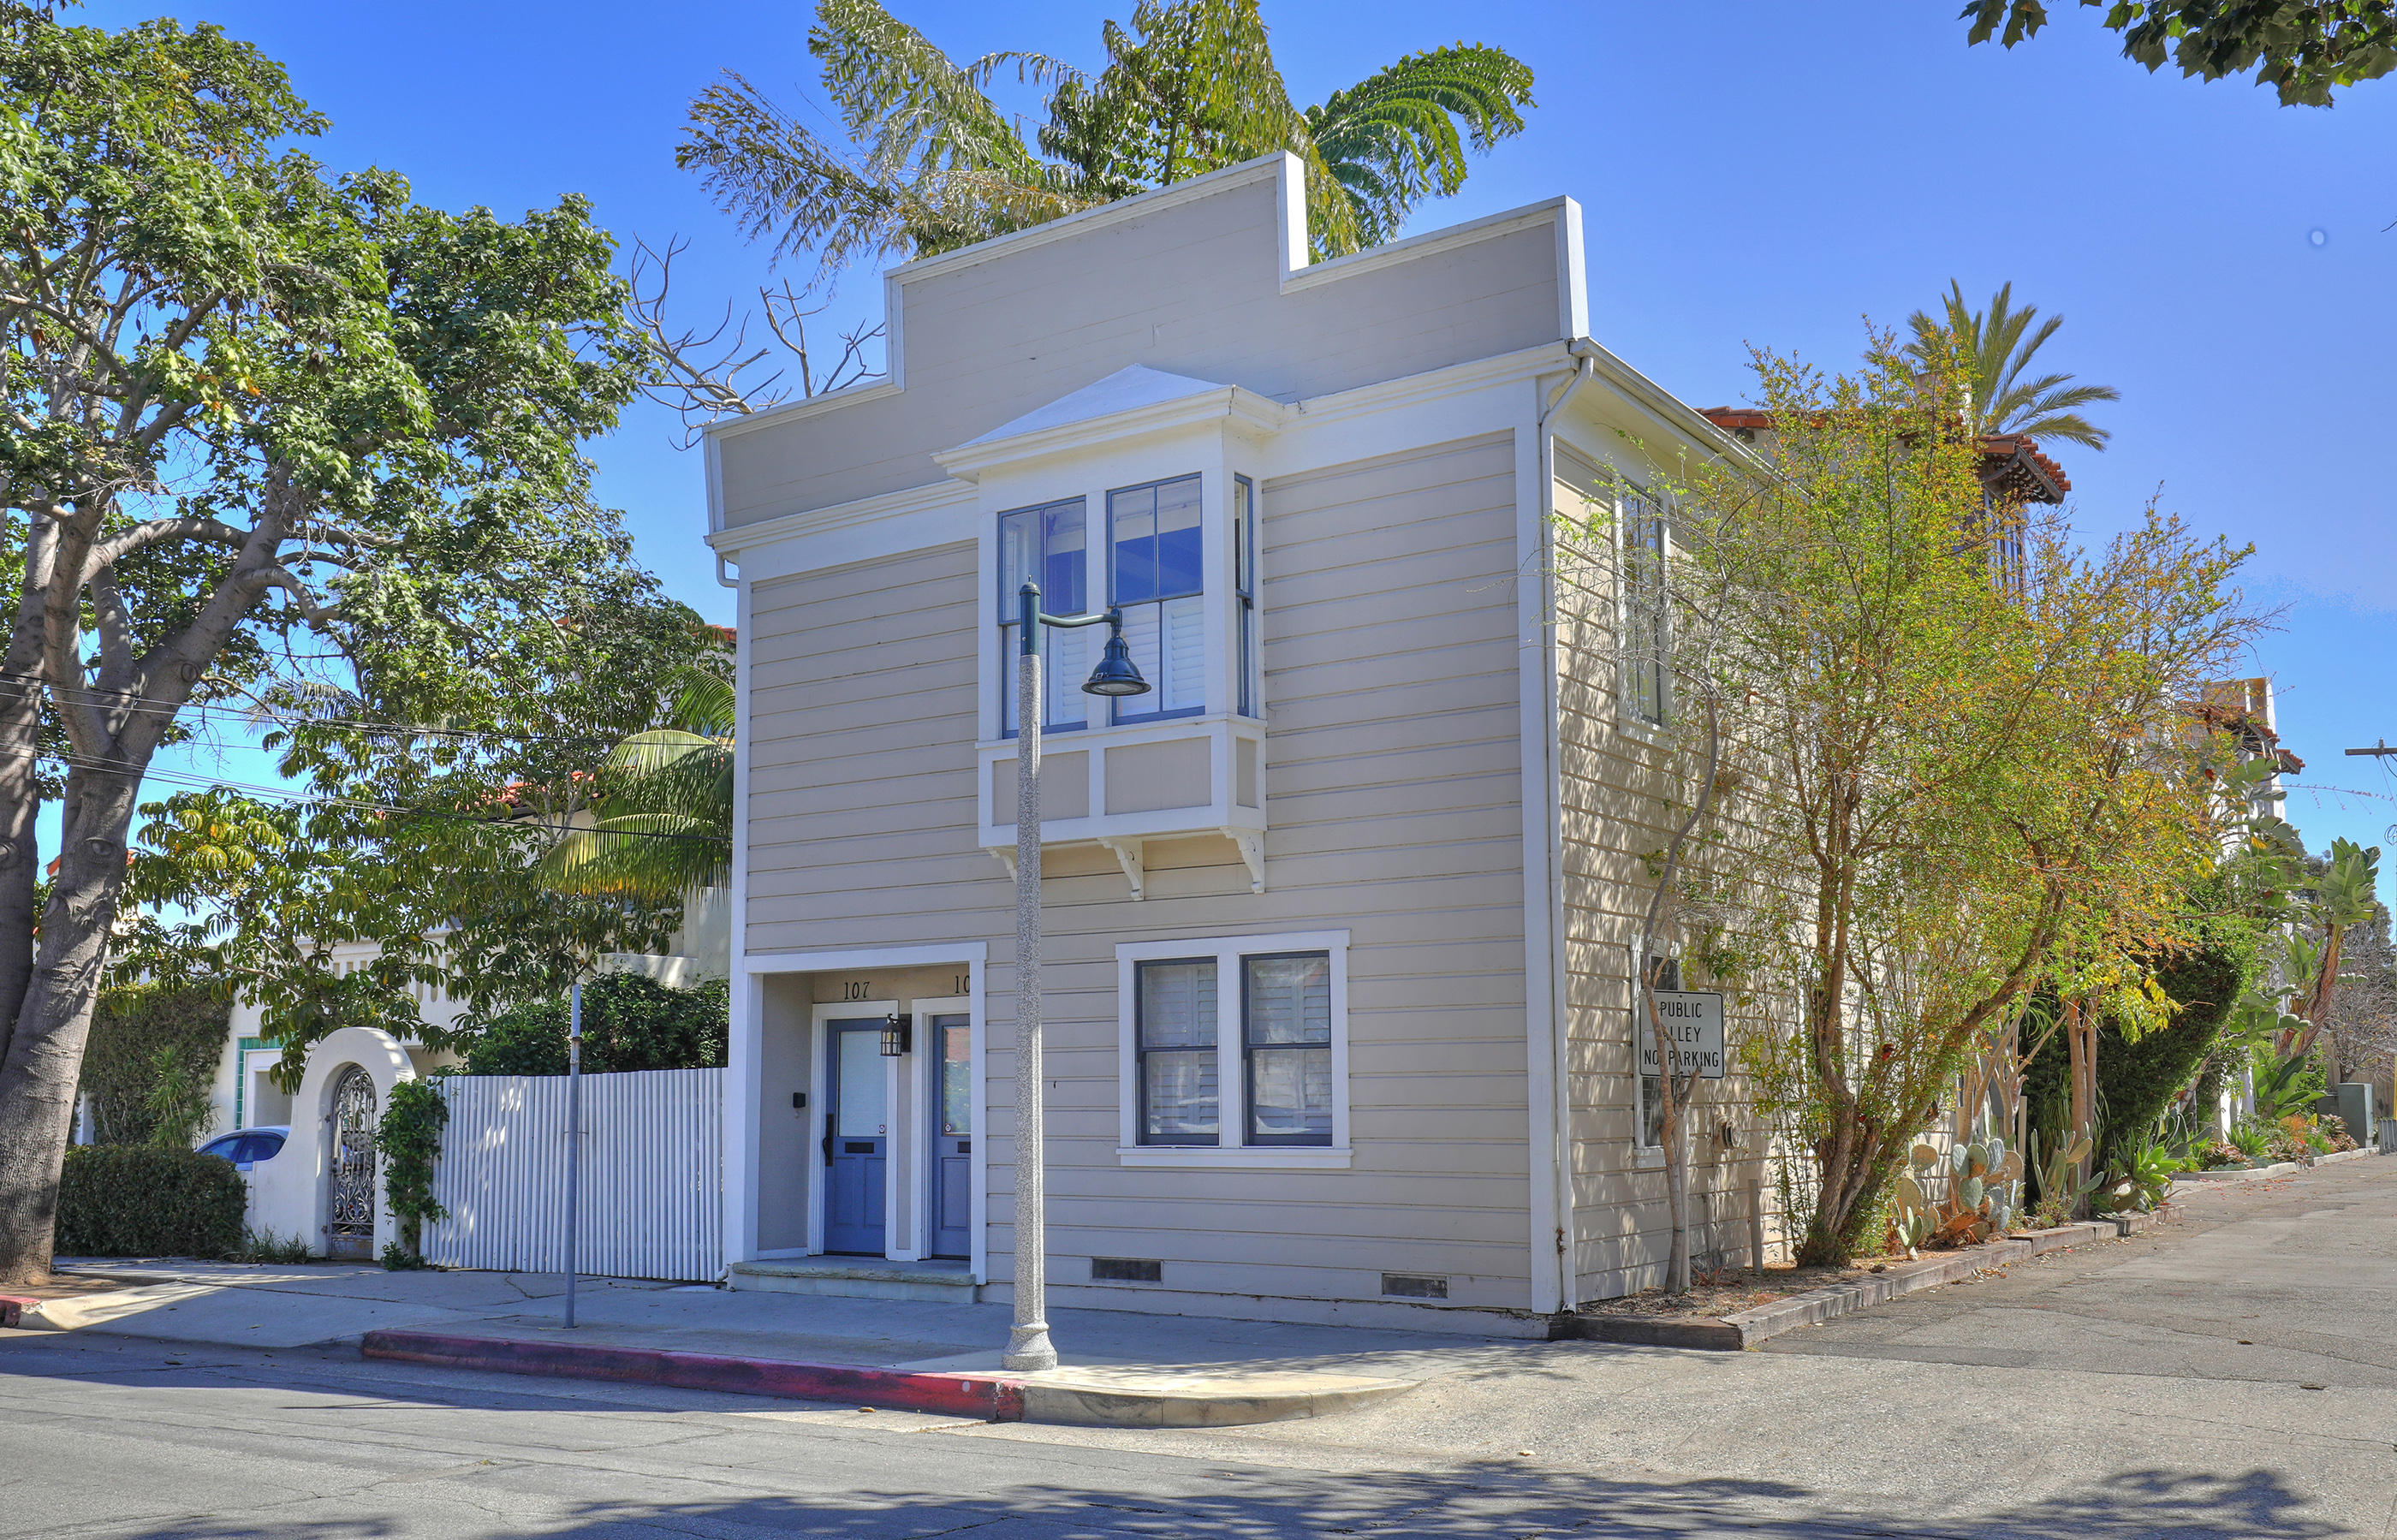 107 W Cota St Santa Barbara, CA 93101